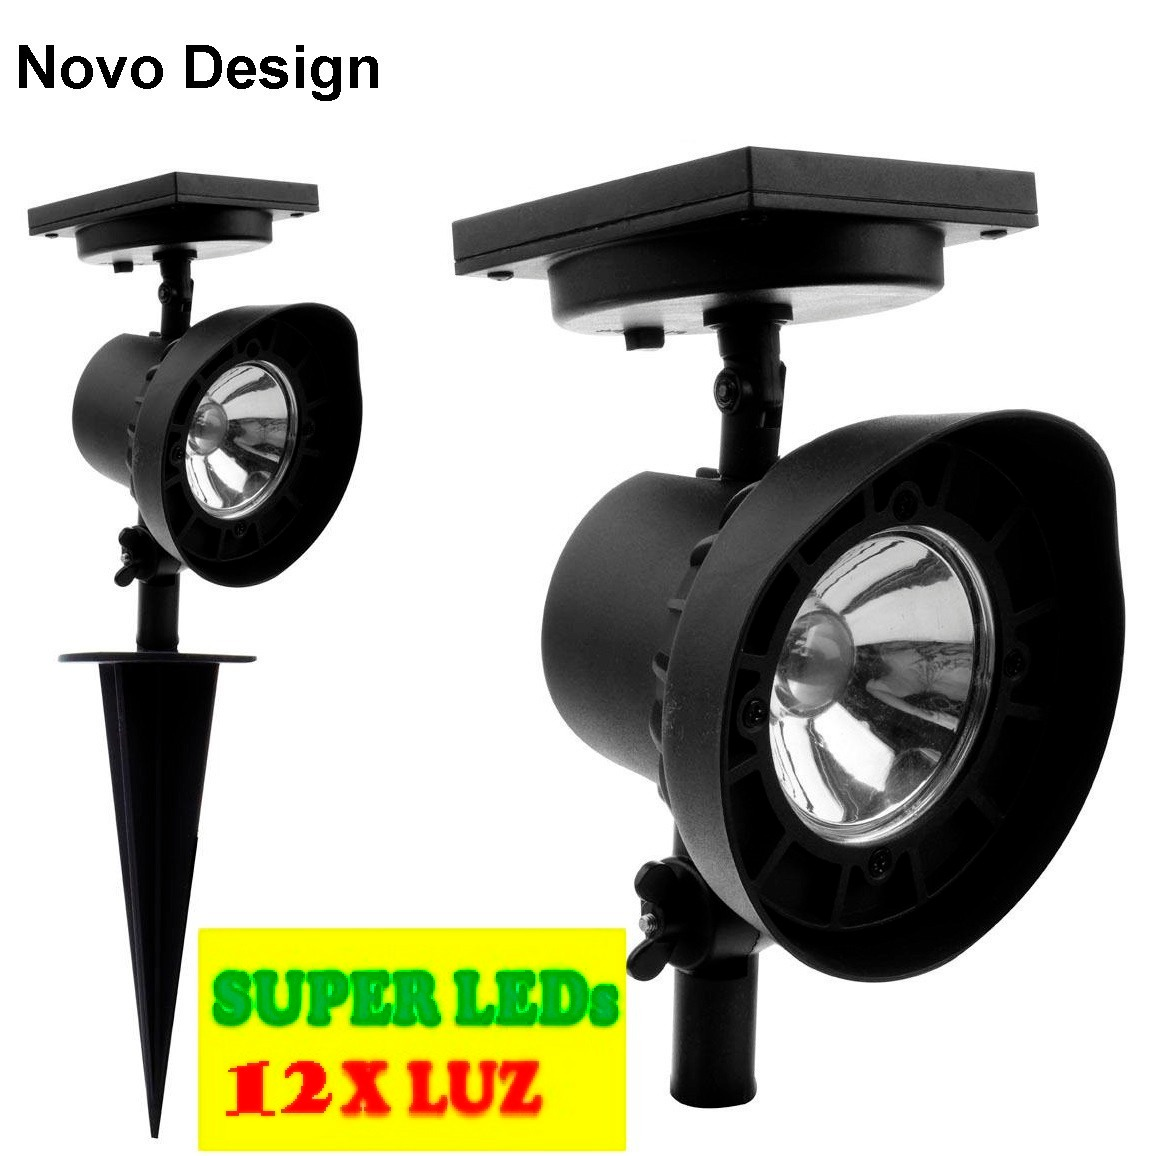 iluminacao jardim verde:Refletor Led Solar Luminária Jardim Spot 6xluz Verde-branca – R$ 49